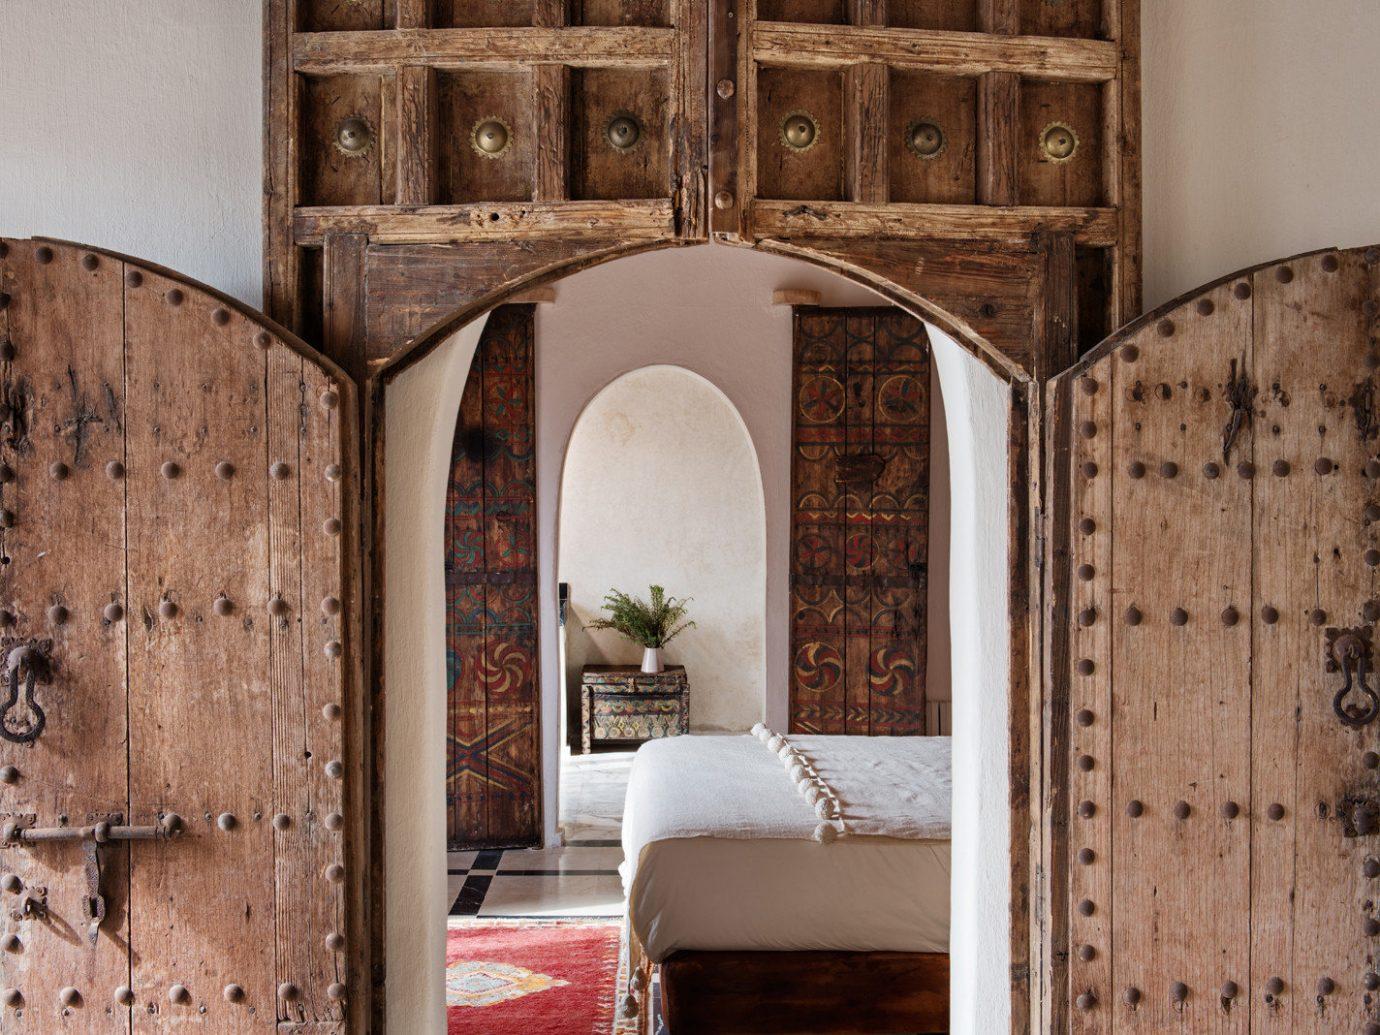 Arts + Culture Marrakech Morocco Style + Design interior design furniture home wood estate window door